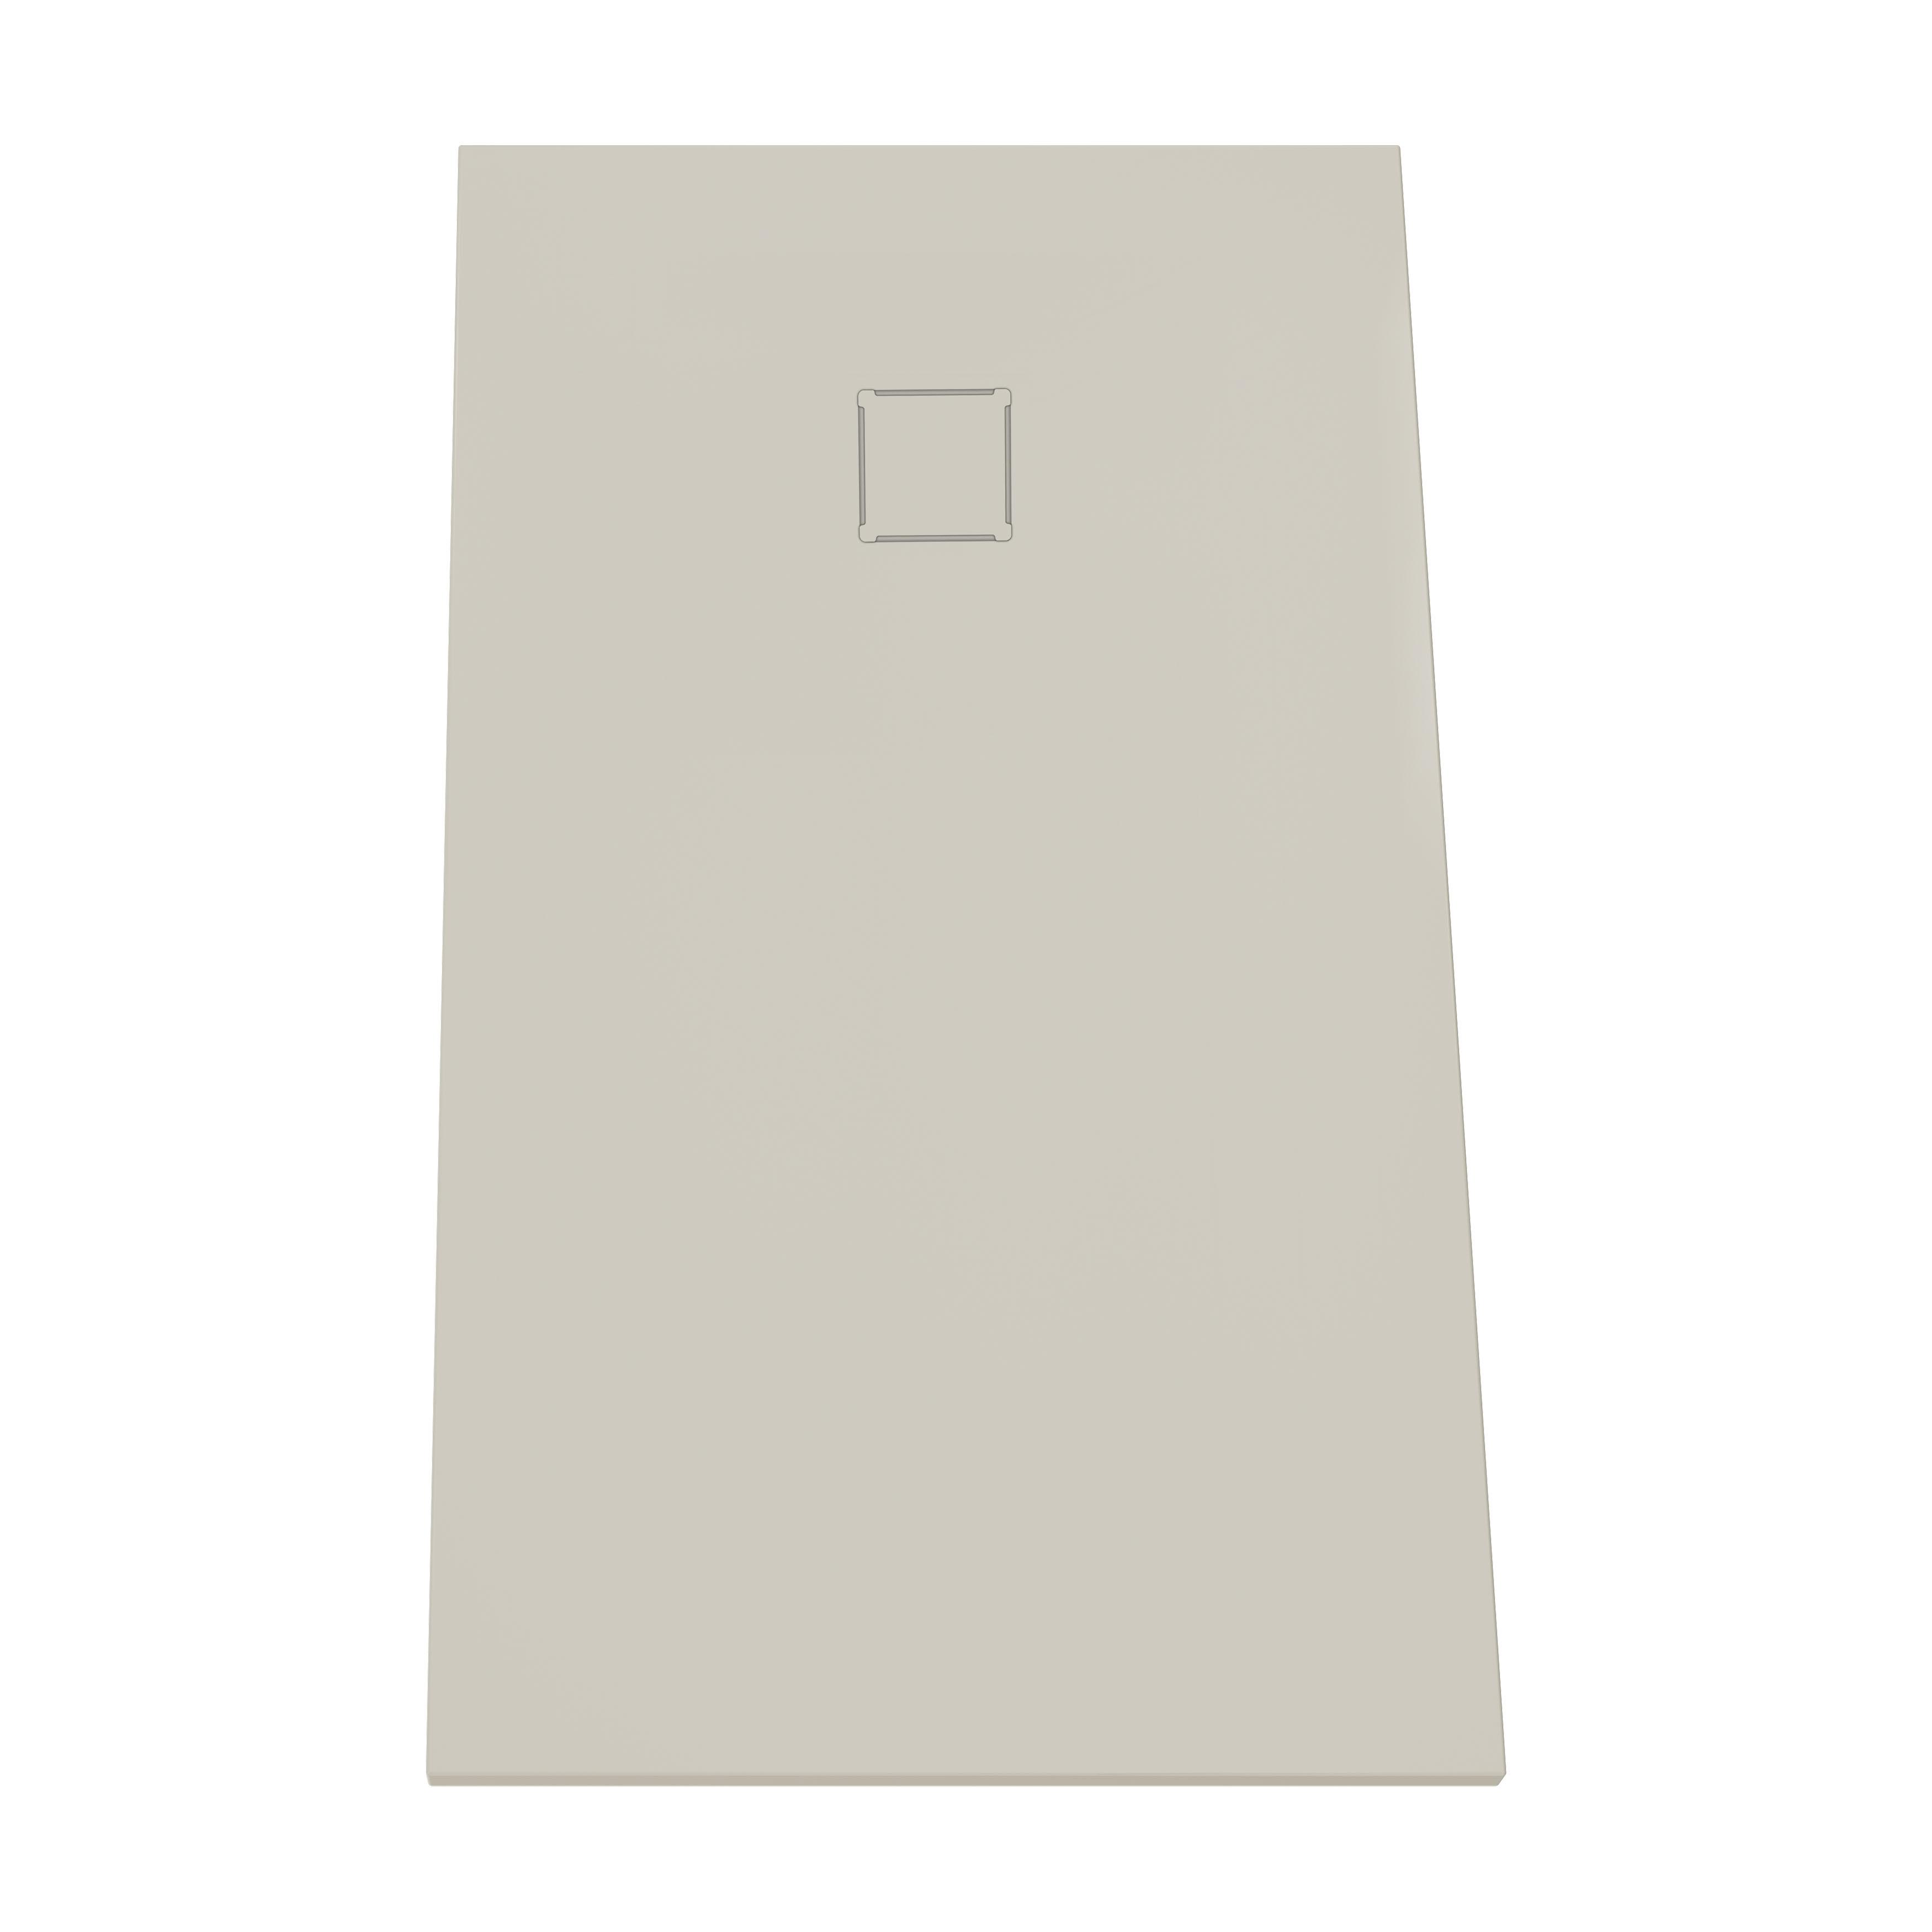 V-stone, receveur ultra plat en solid stone, 140  x  80 cm, taupe